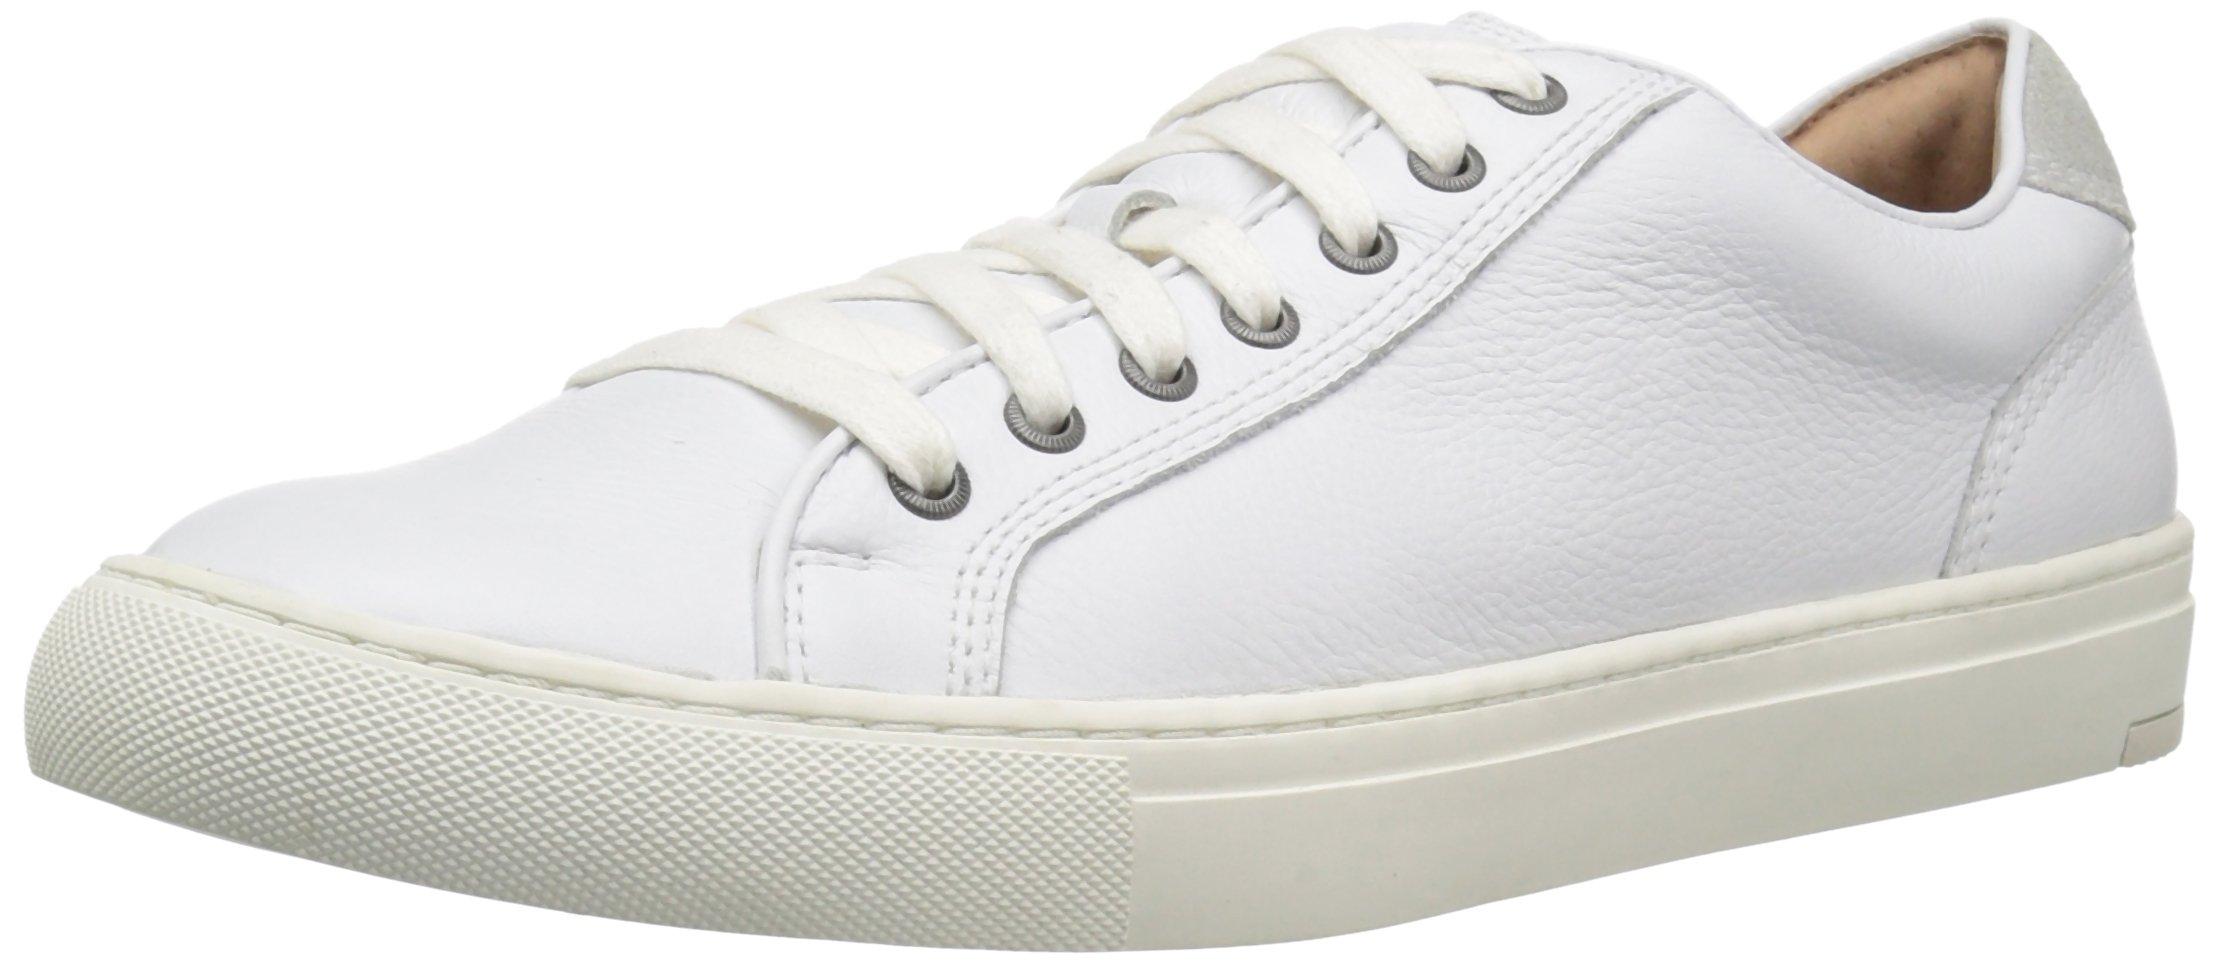 206 Collective Men's Prospect Lace-up Fashion Sneaker, White, 10.5 D US